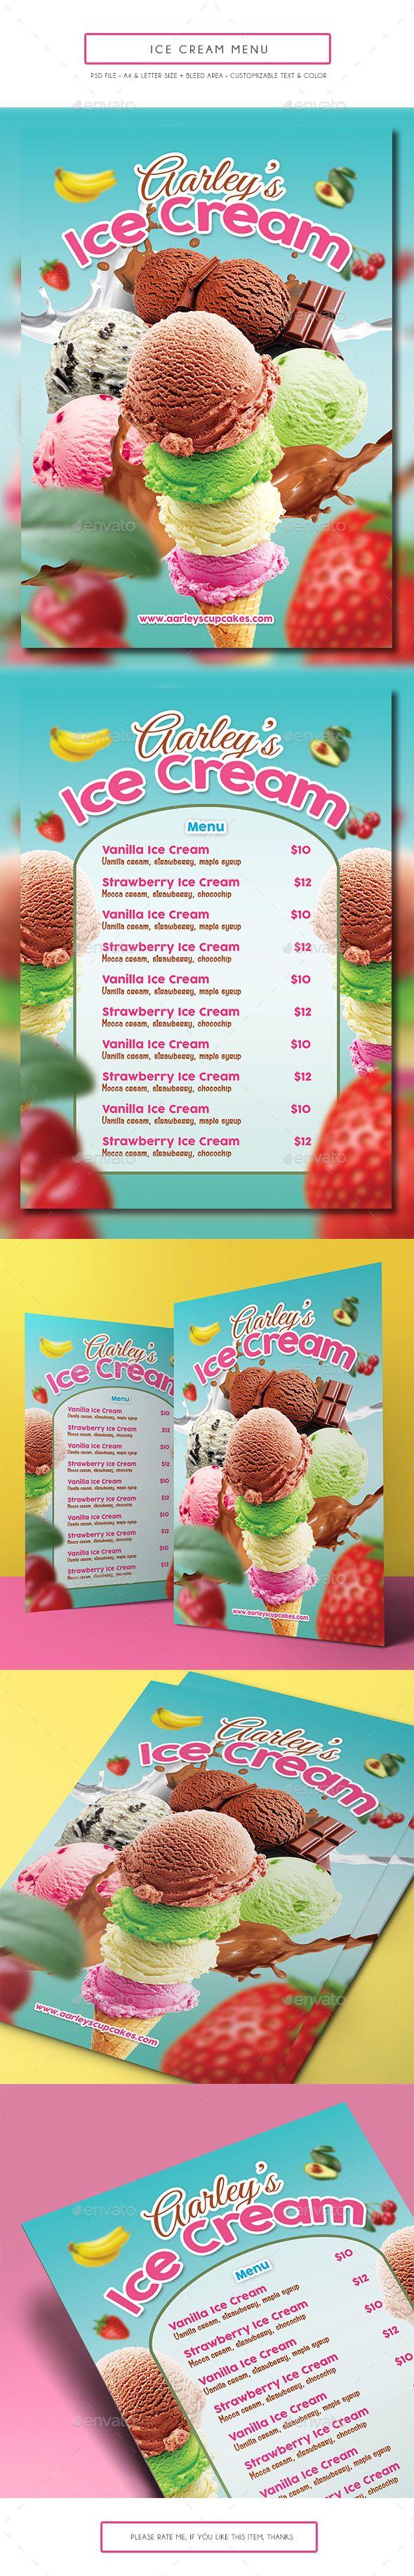 Ice Cream Menu Template PSD. Download here: http://graphicriver.net/item/ice-cream-menu/14688777?ref=ksioks